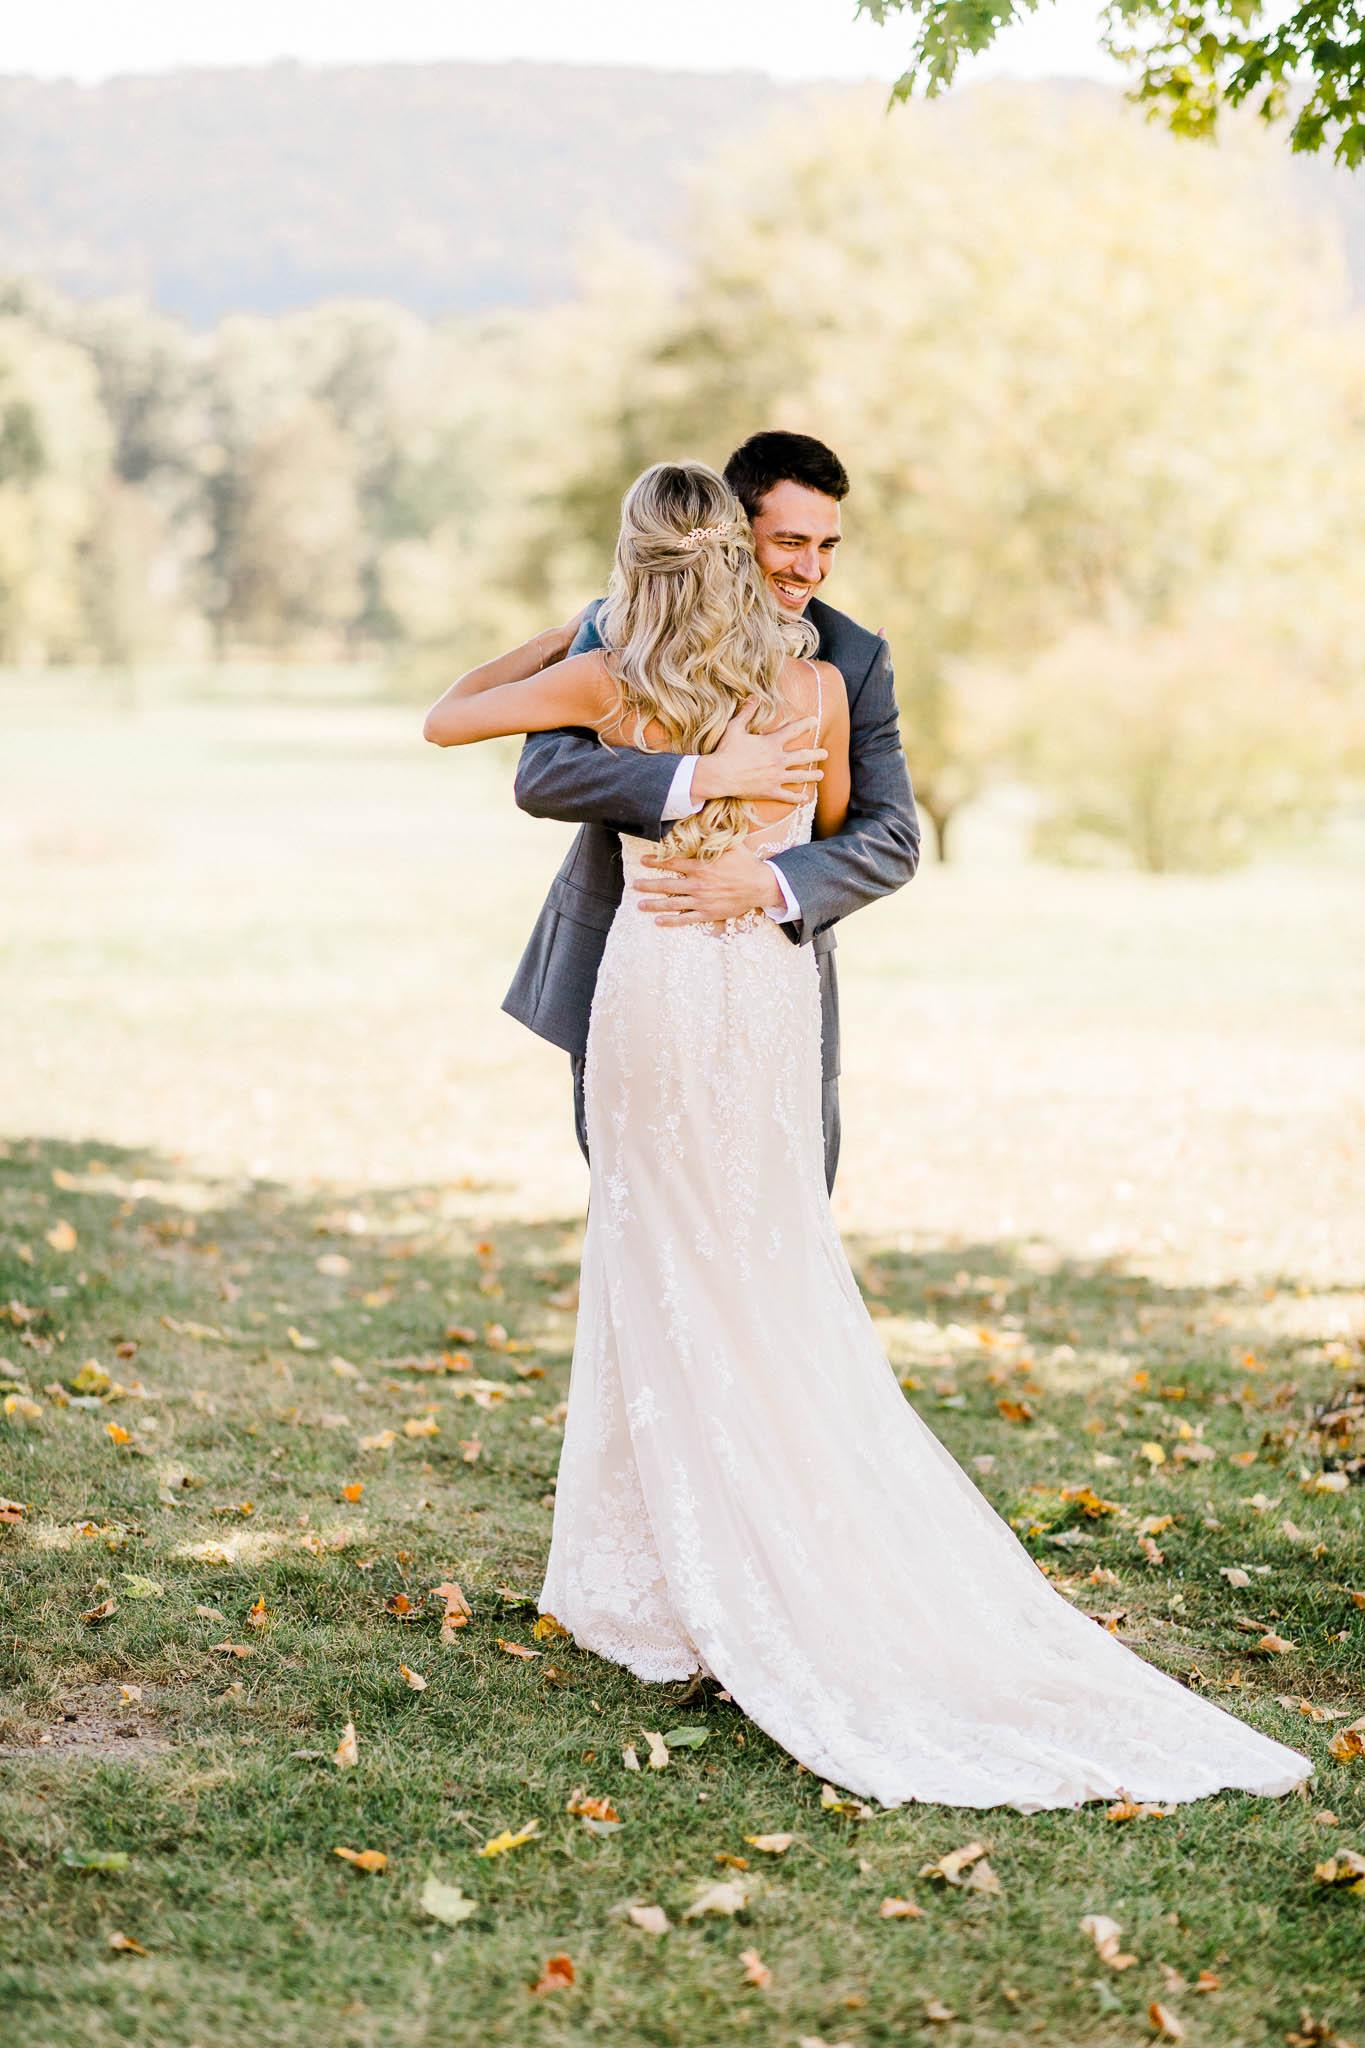 Frosty-Valley-September-Wedding-7176.jpg